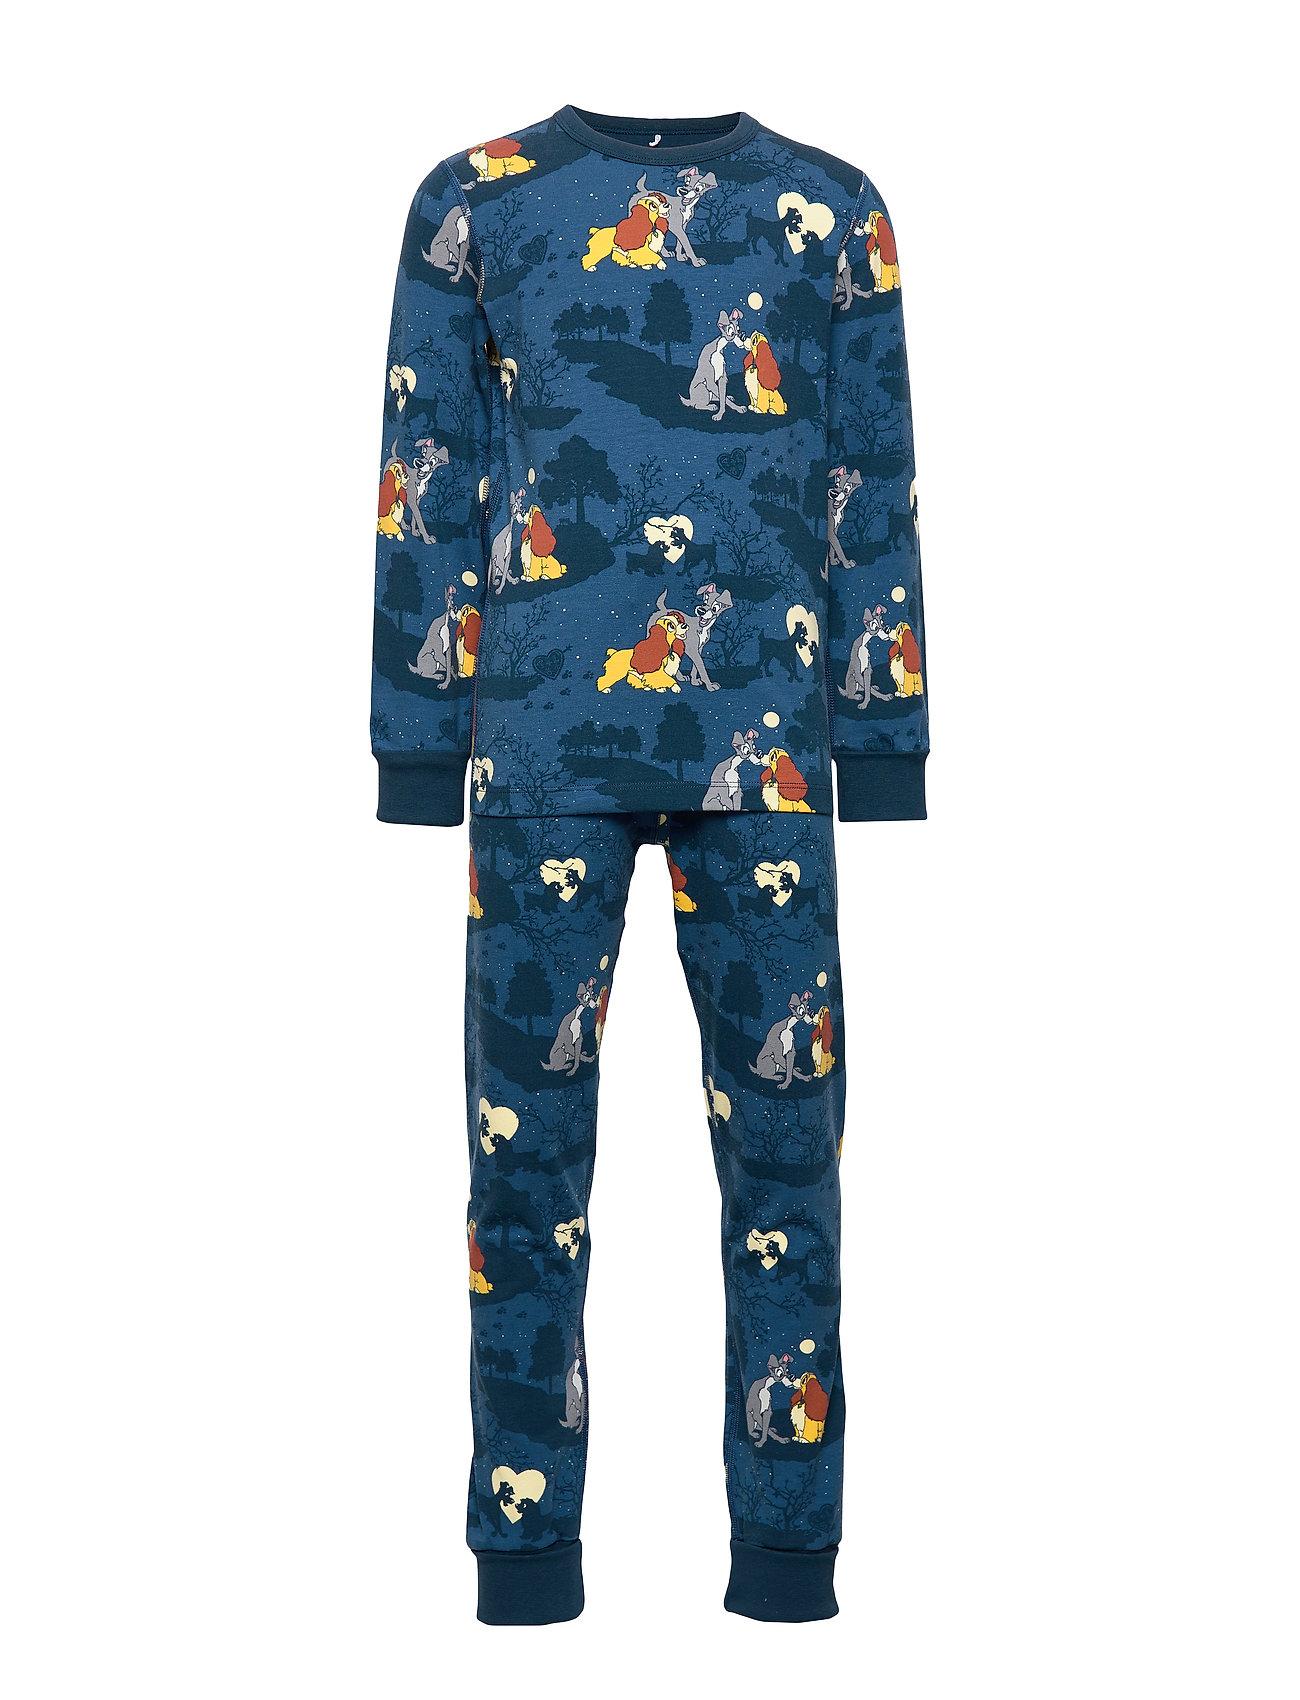 Polarn O. Pyret Disney Collection Pyjamas AOP Preschool - DARK BLUE